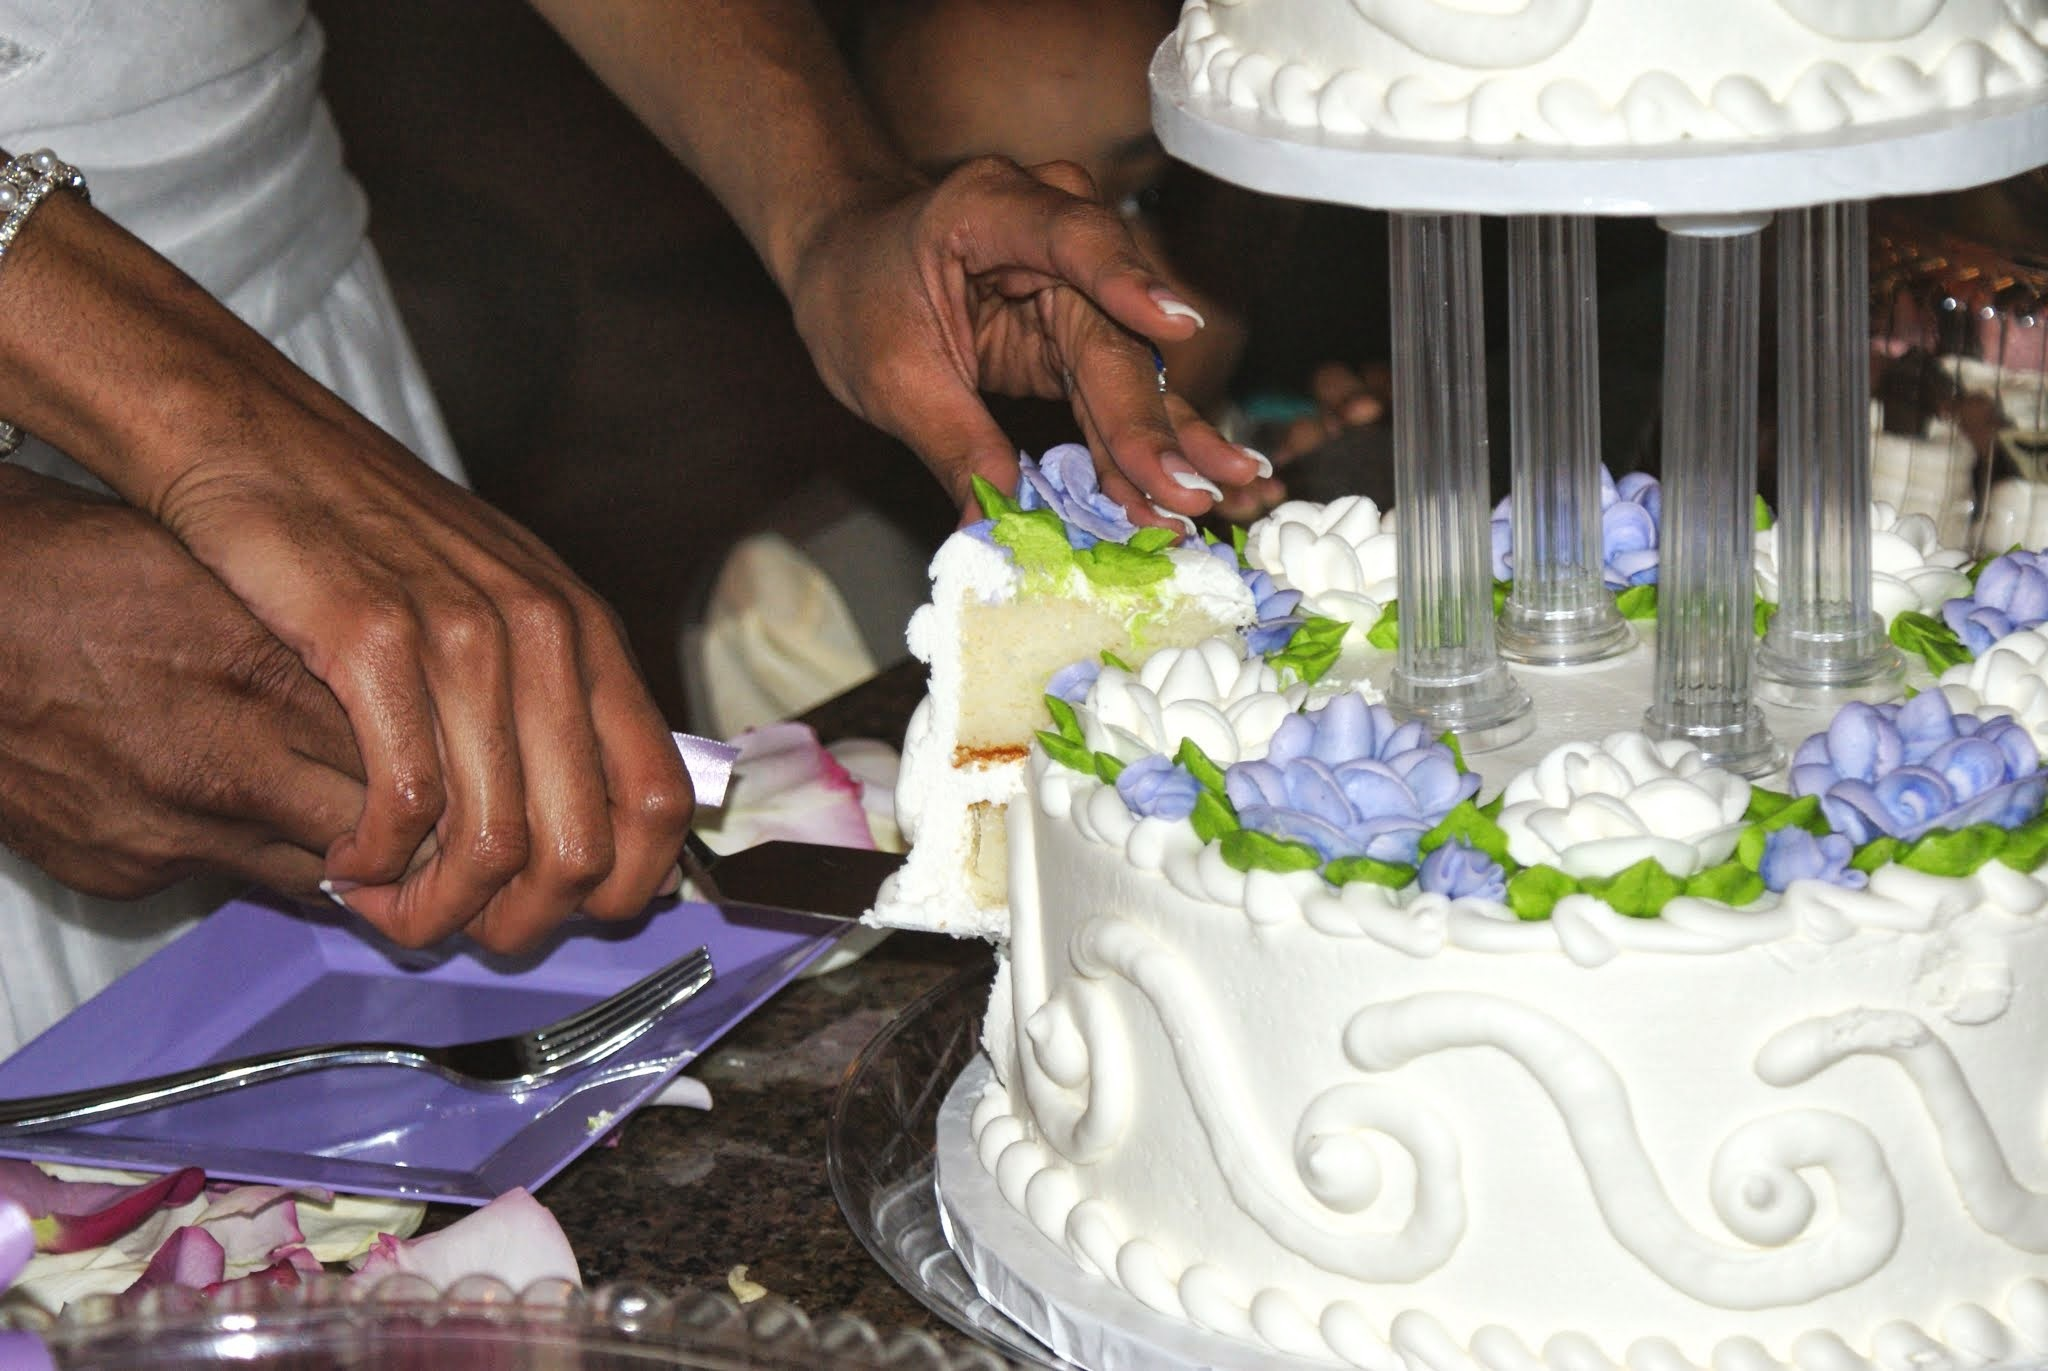 Reception, Flowers & Decor, Cakes, white, purple, cake, Cutting